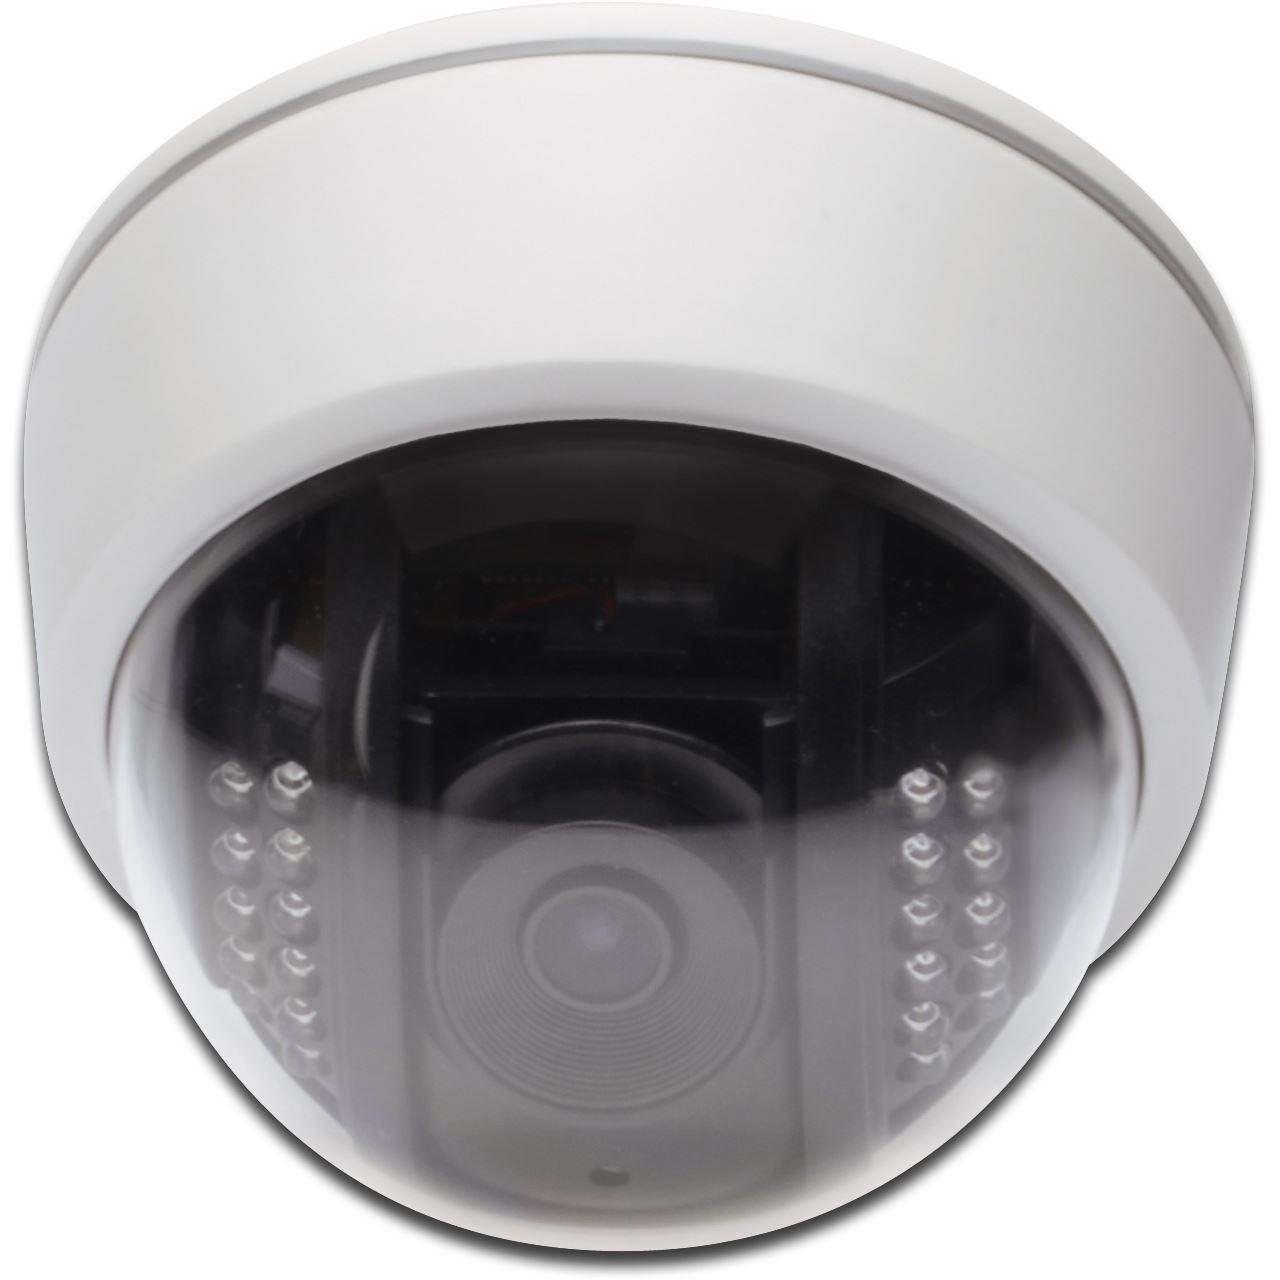 digitus ip cam optidome wlan plug view indoor tag nacht ip kameras lan. Black Bedroom Furniture Sets. Home Design Ideas